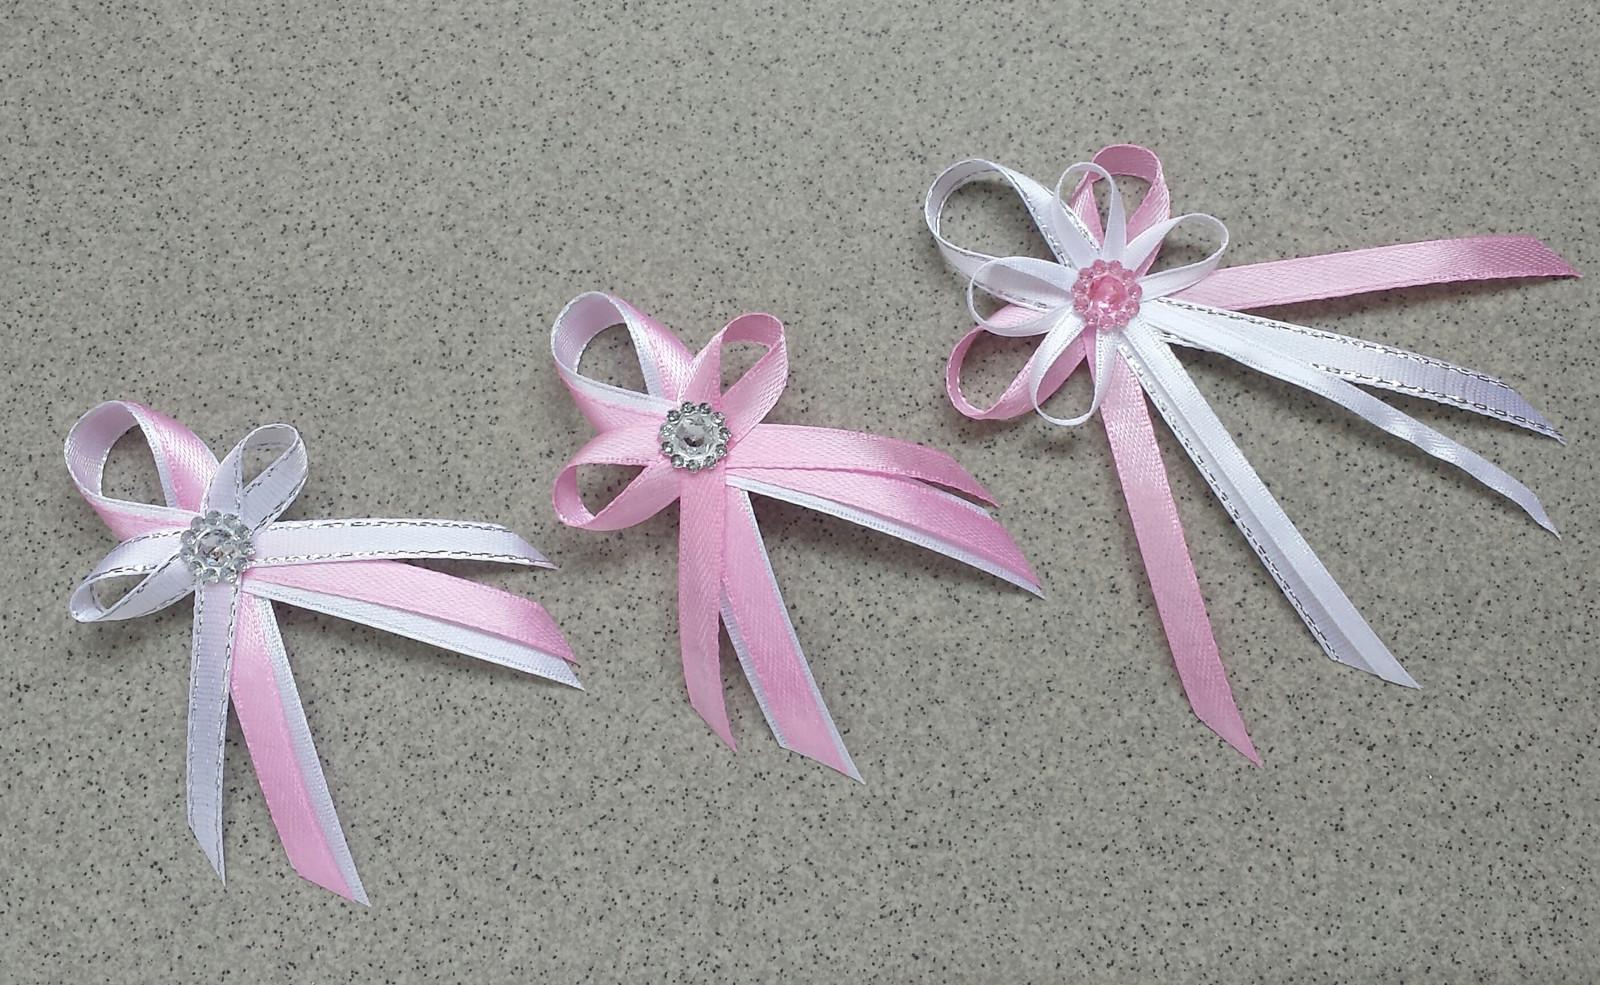 Krajkový bílo/růžový SW podvazek - Obrázek č. 3